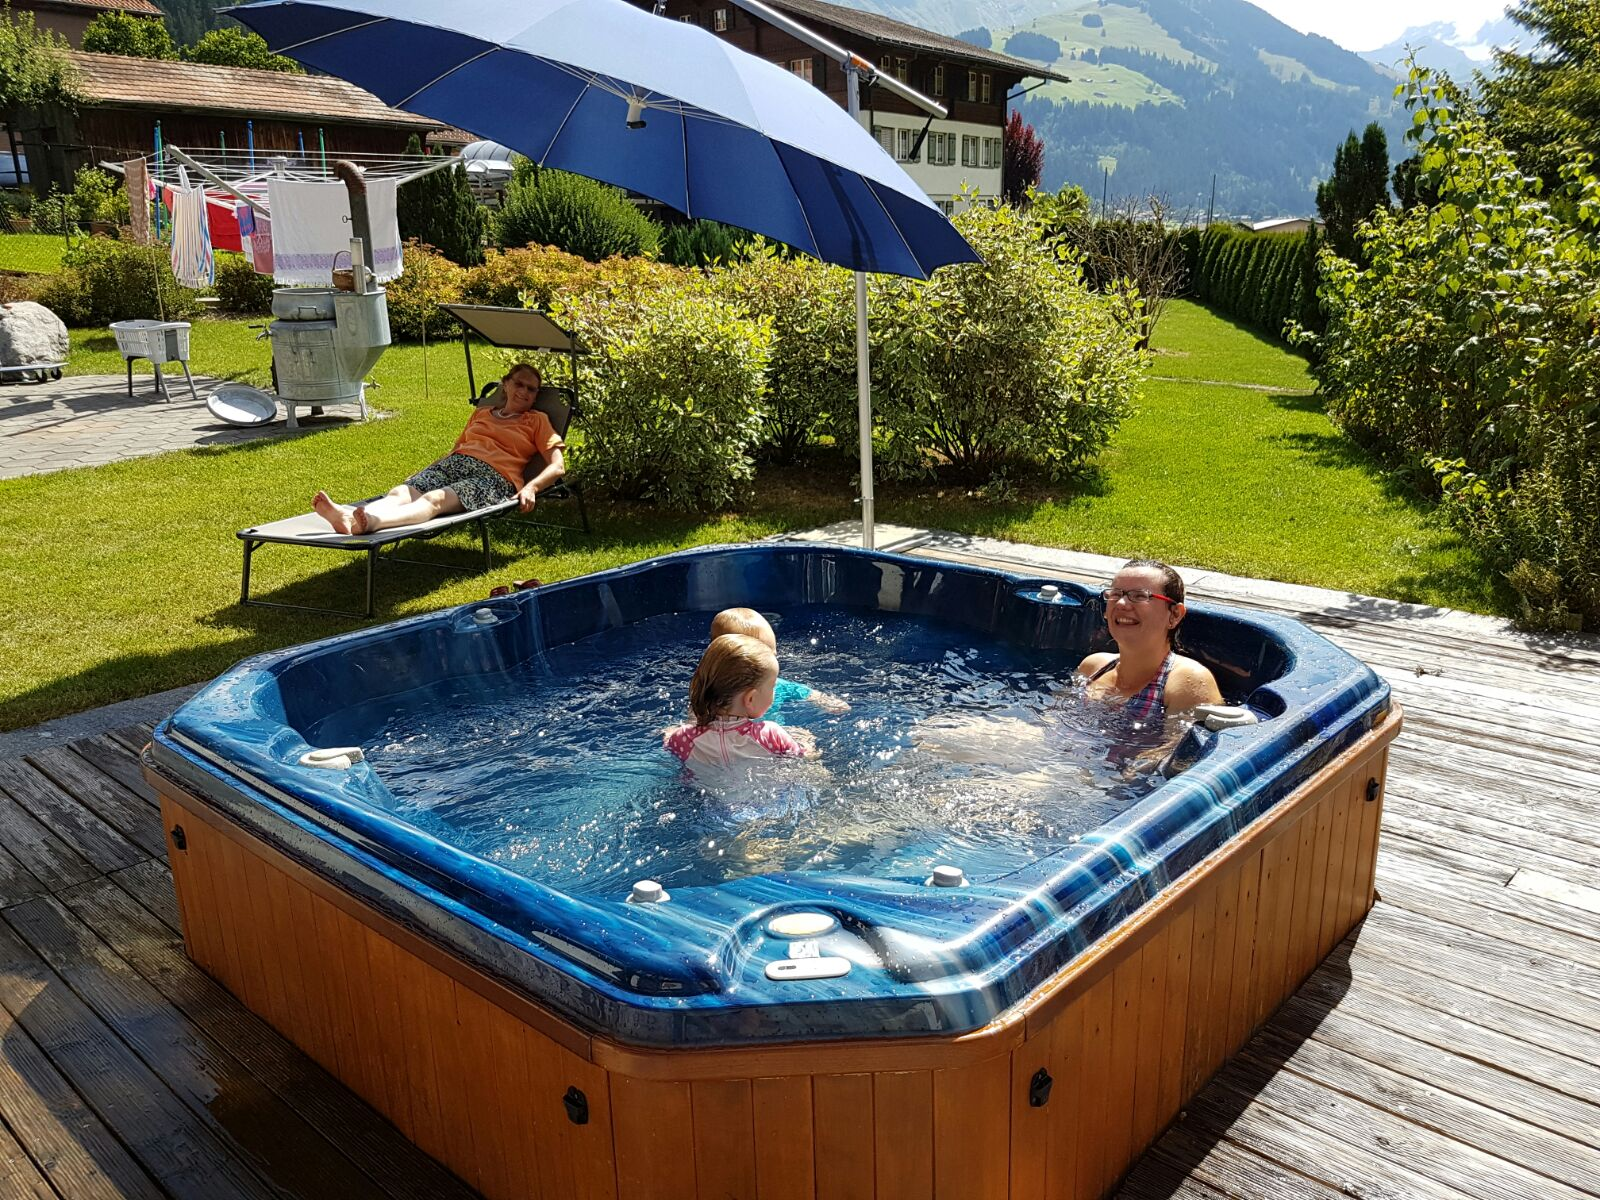 Chalet-Hotel Alpenblick Wildstrubel 6